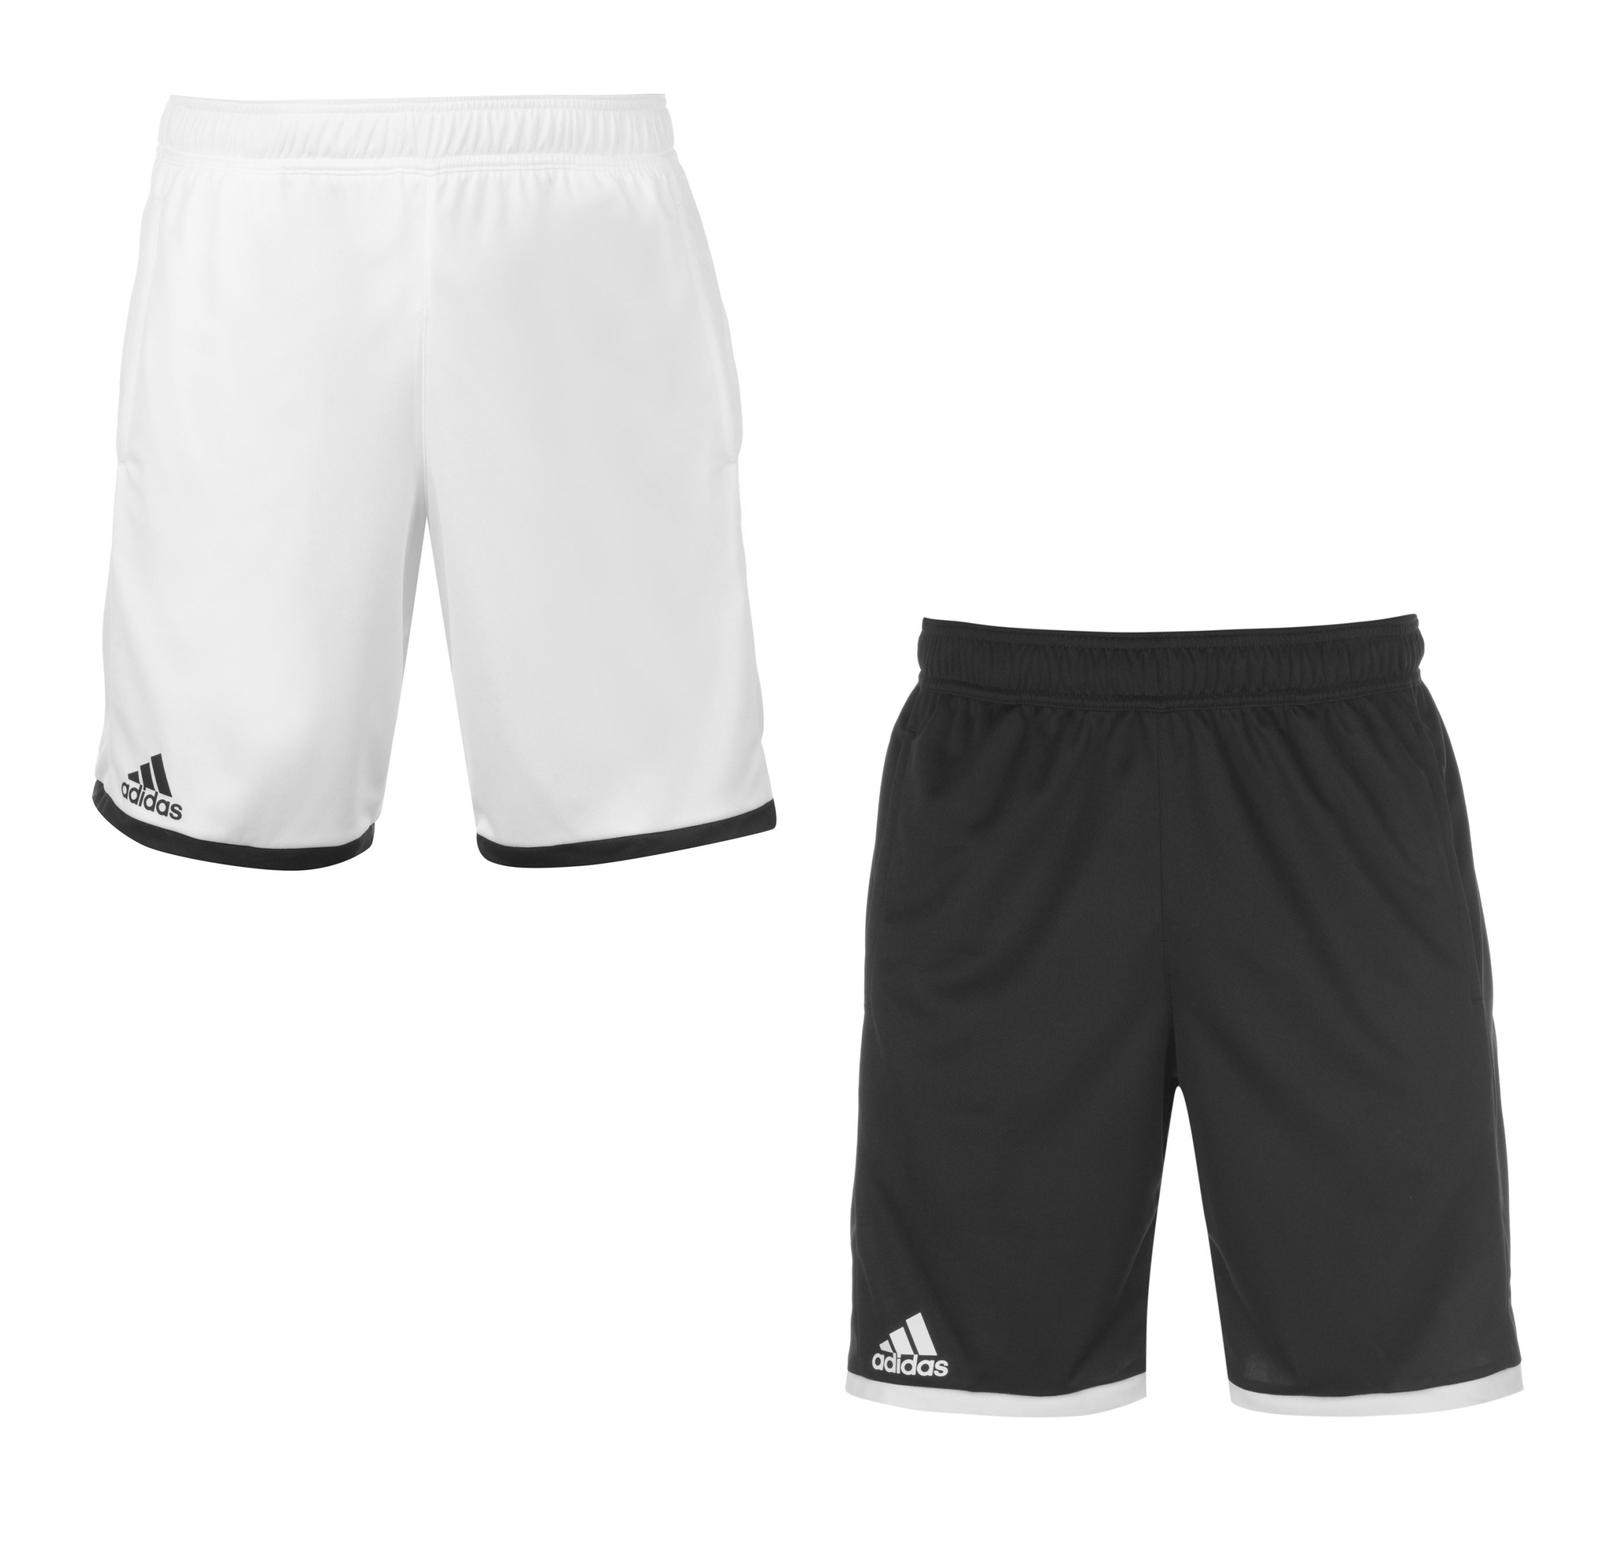 Adidas Court Herren Shorts Sport Hose Short Trousers Bermuda Sport Trousers 1465